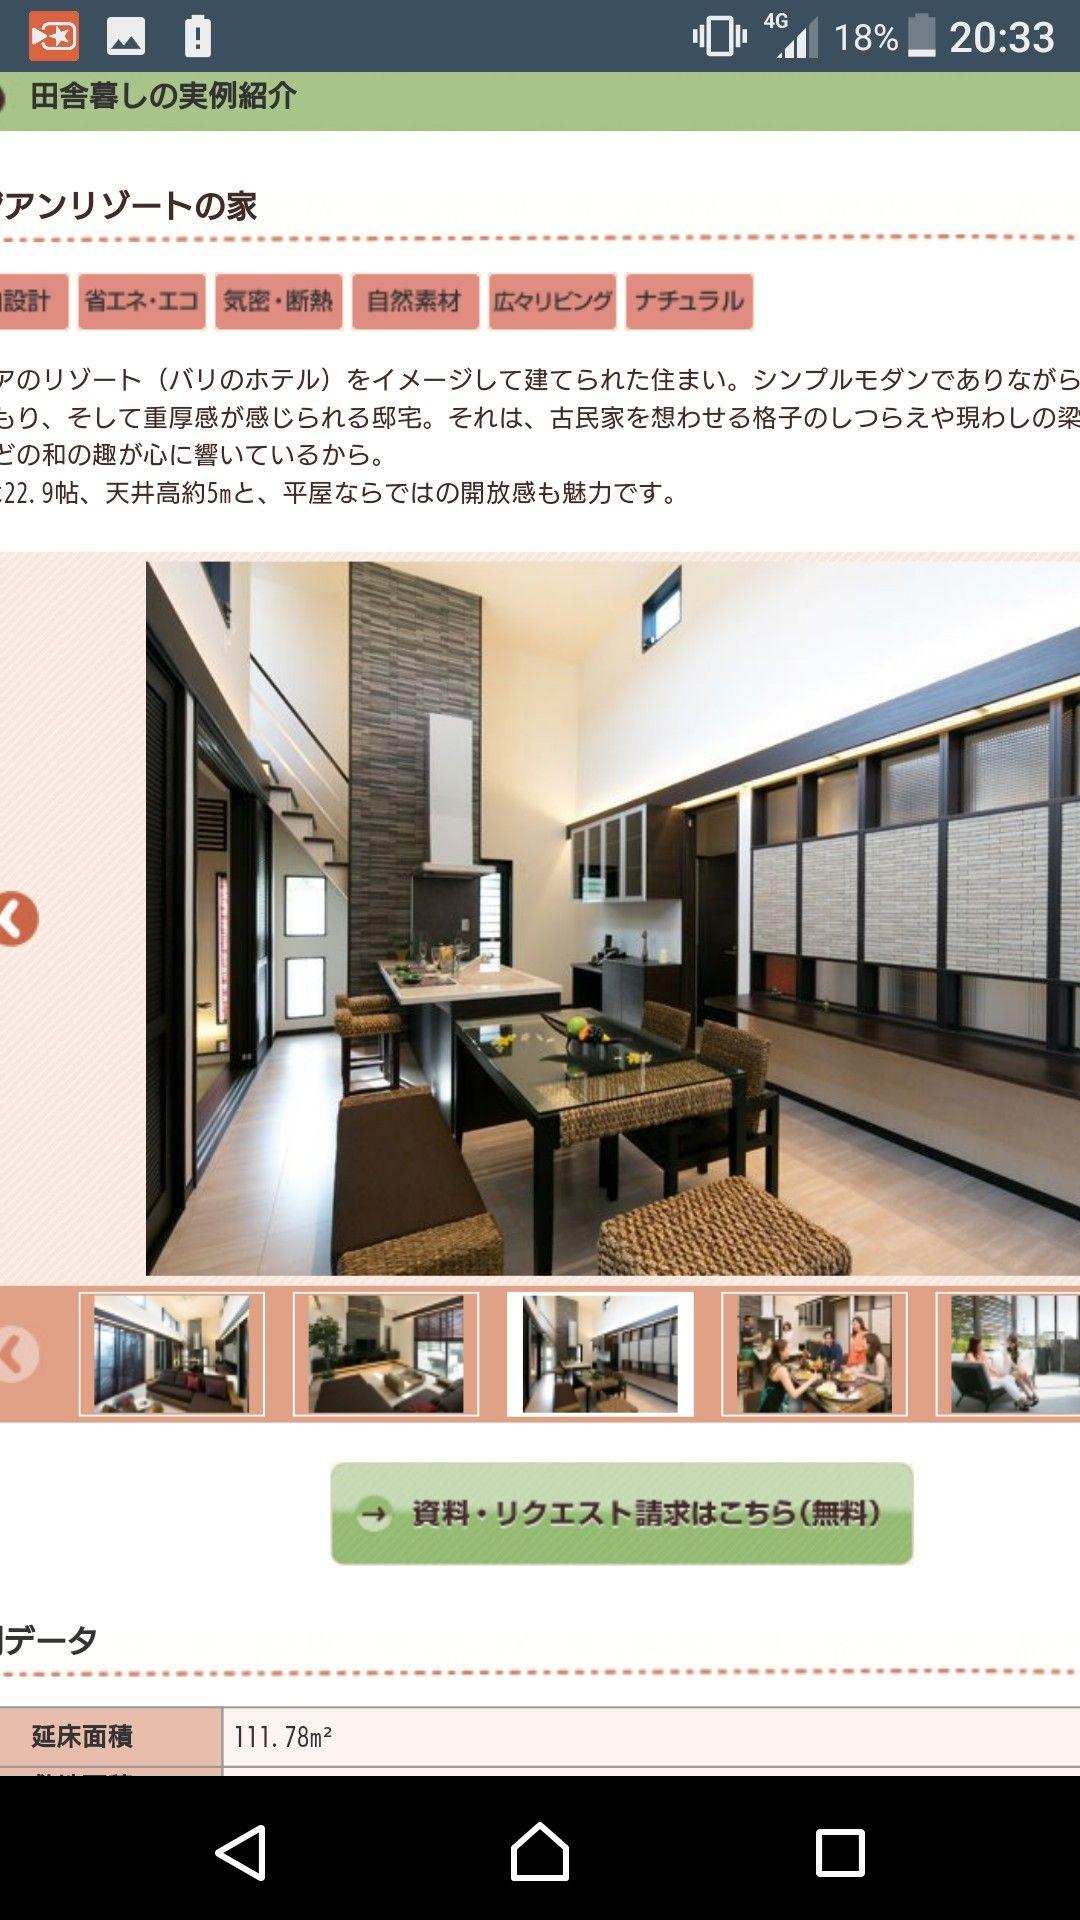 Home design bilder im freien pin by y a on リビング  pinterest